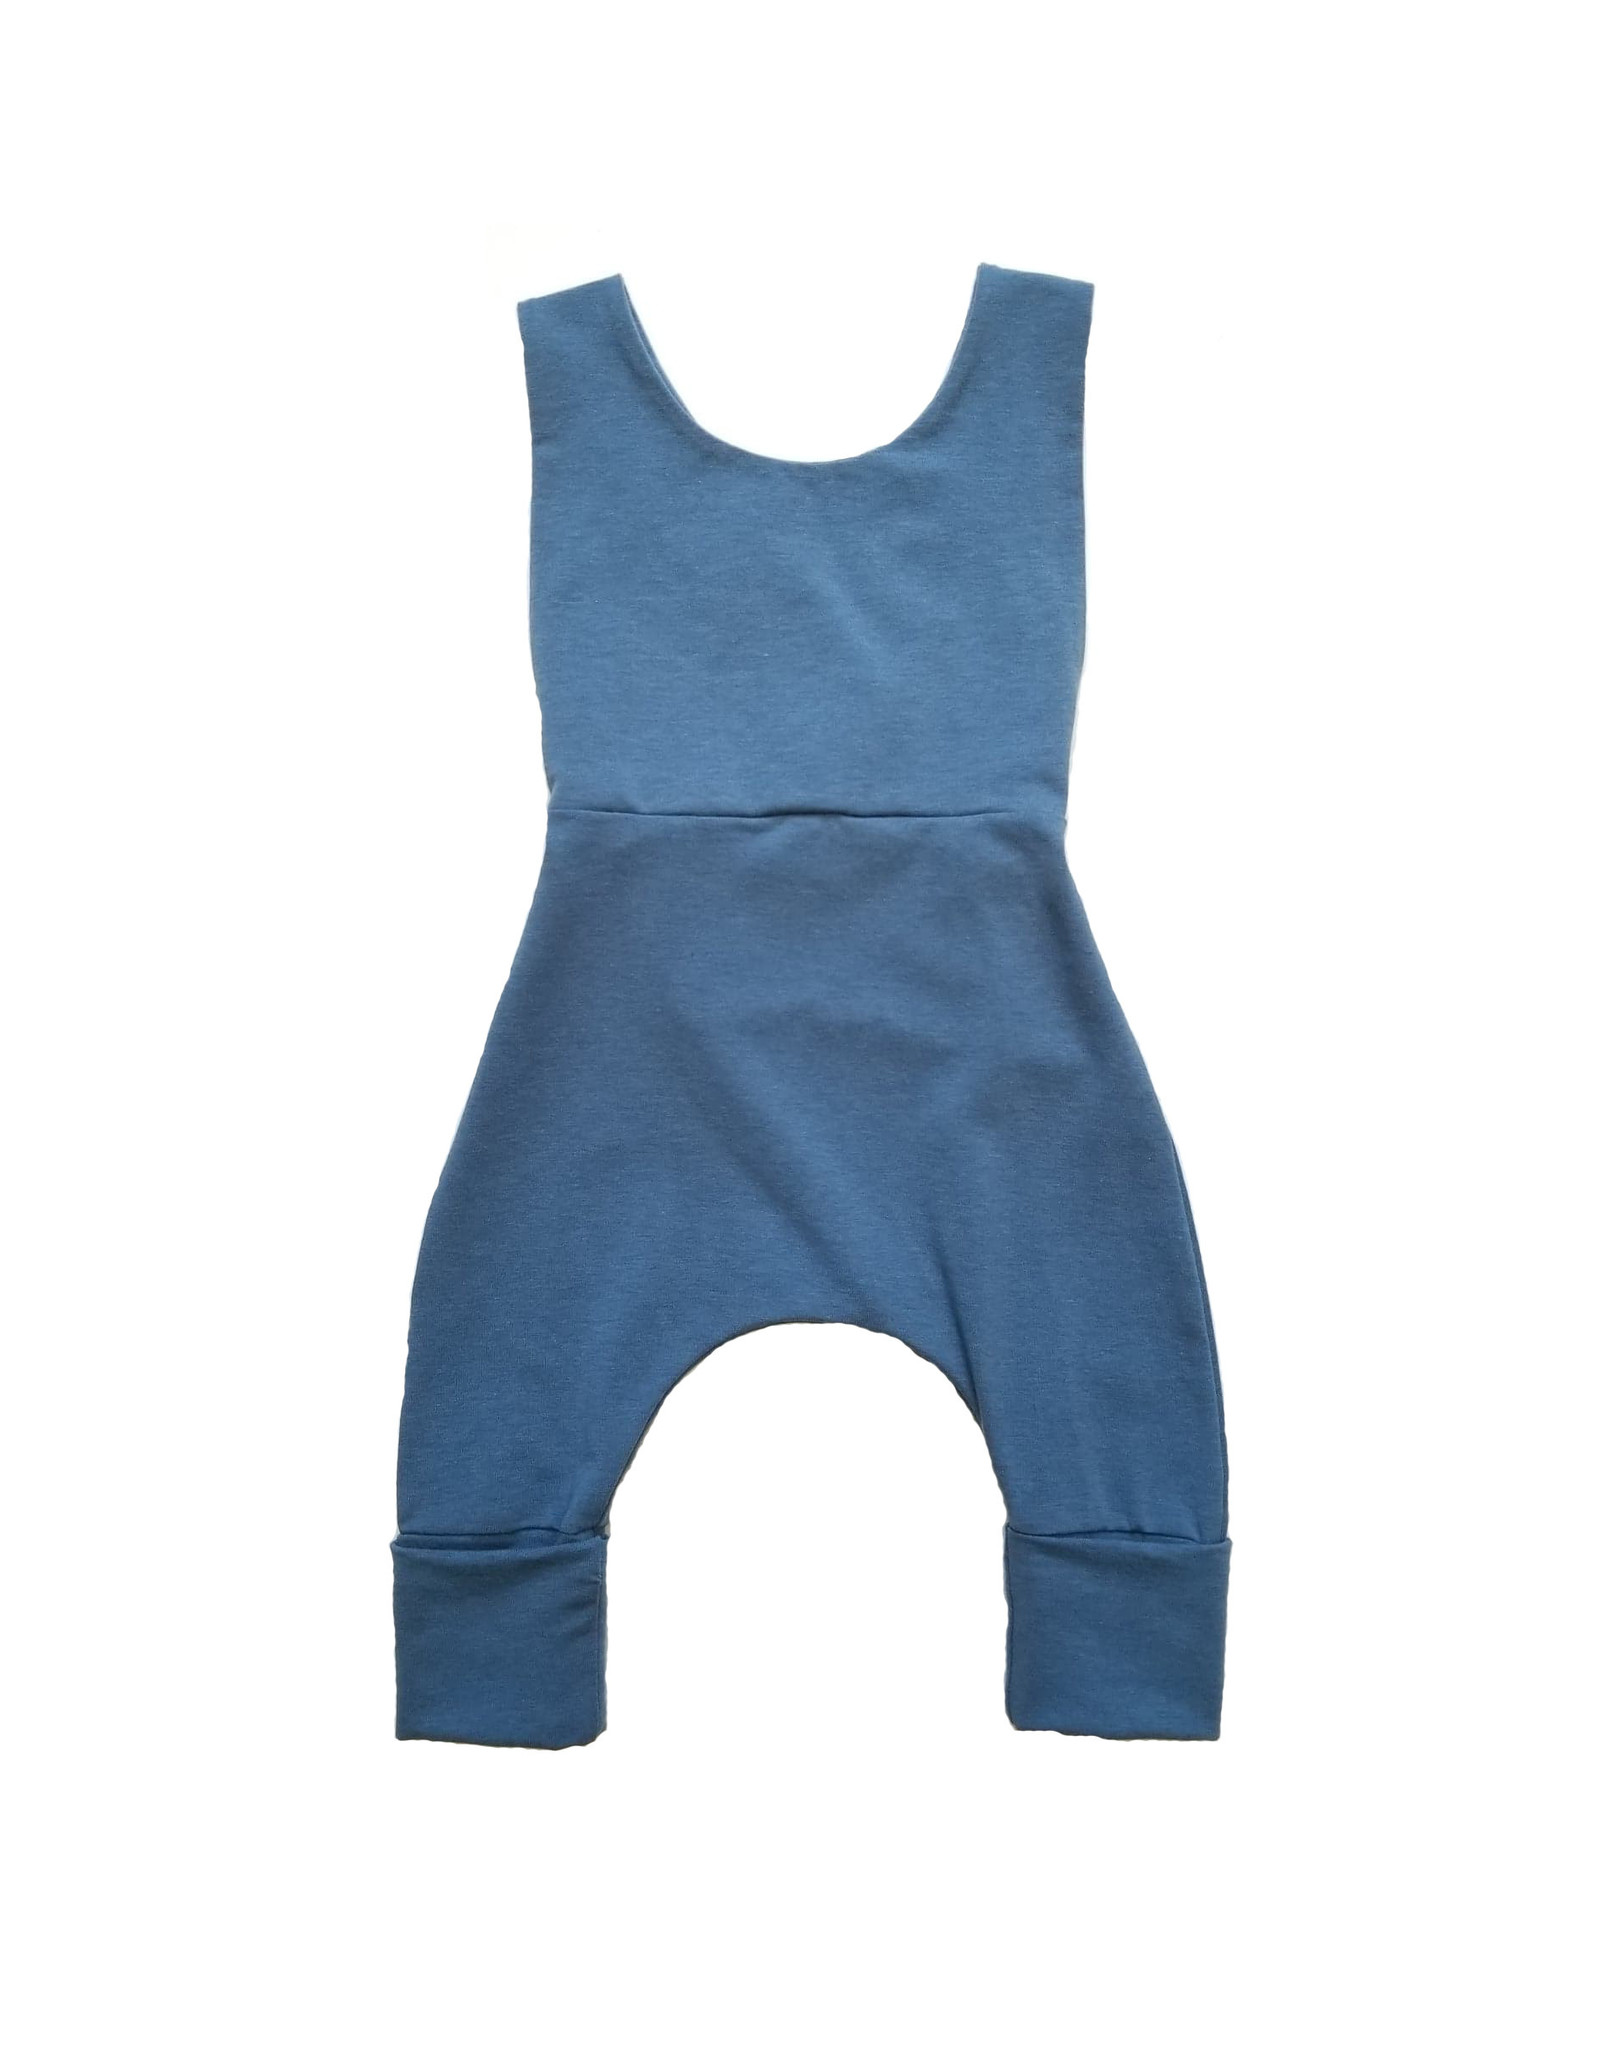 Kid's Stuff Salopette évolutive bleu